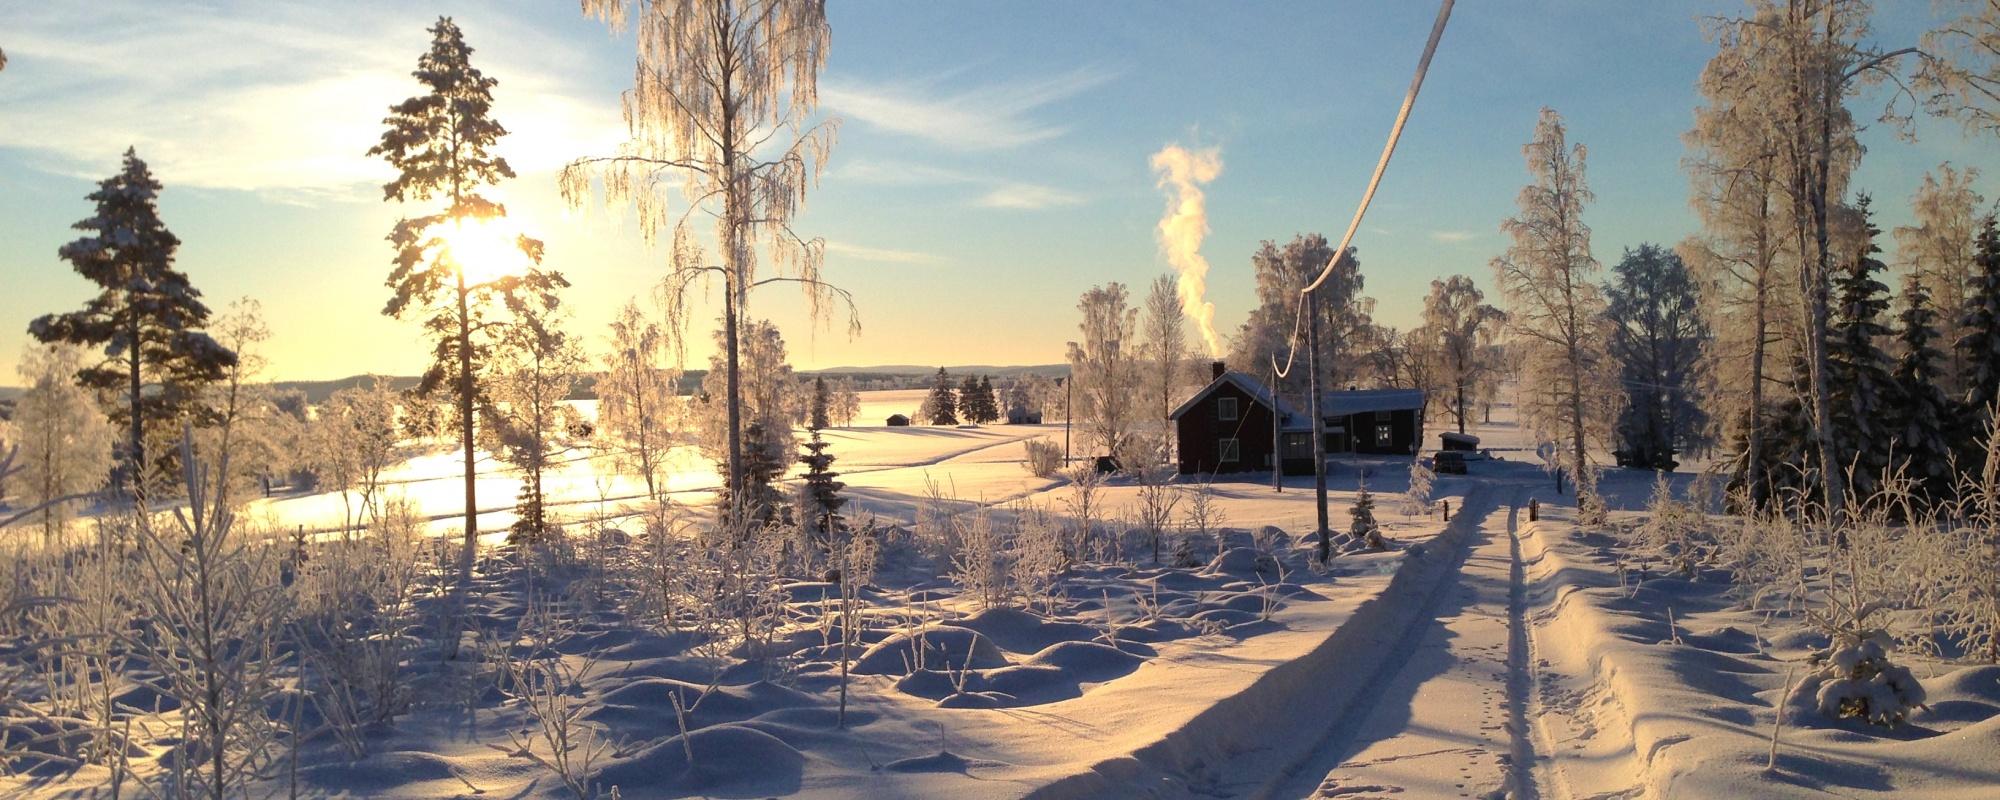 Vinter i Innansjön